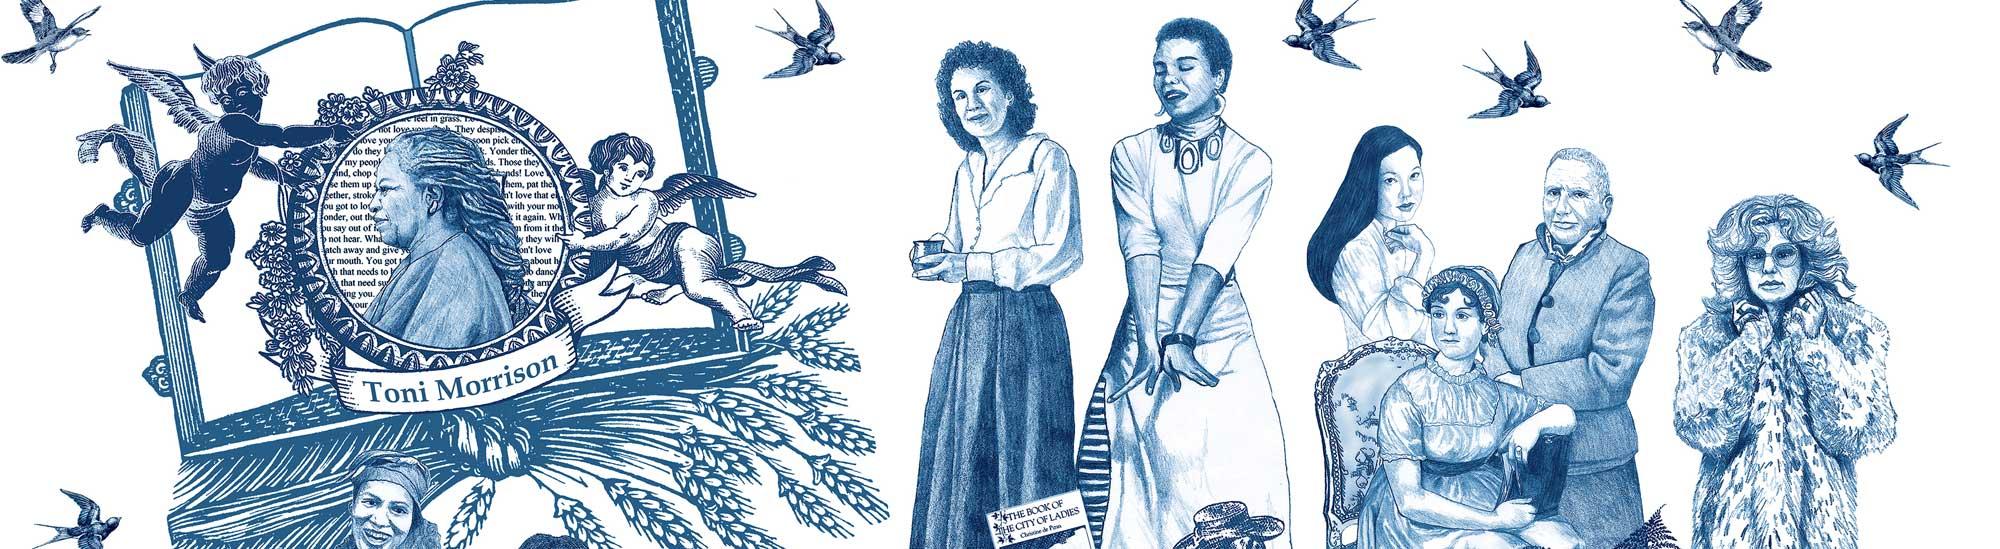 Toni Morrison blog banner